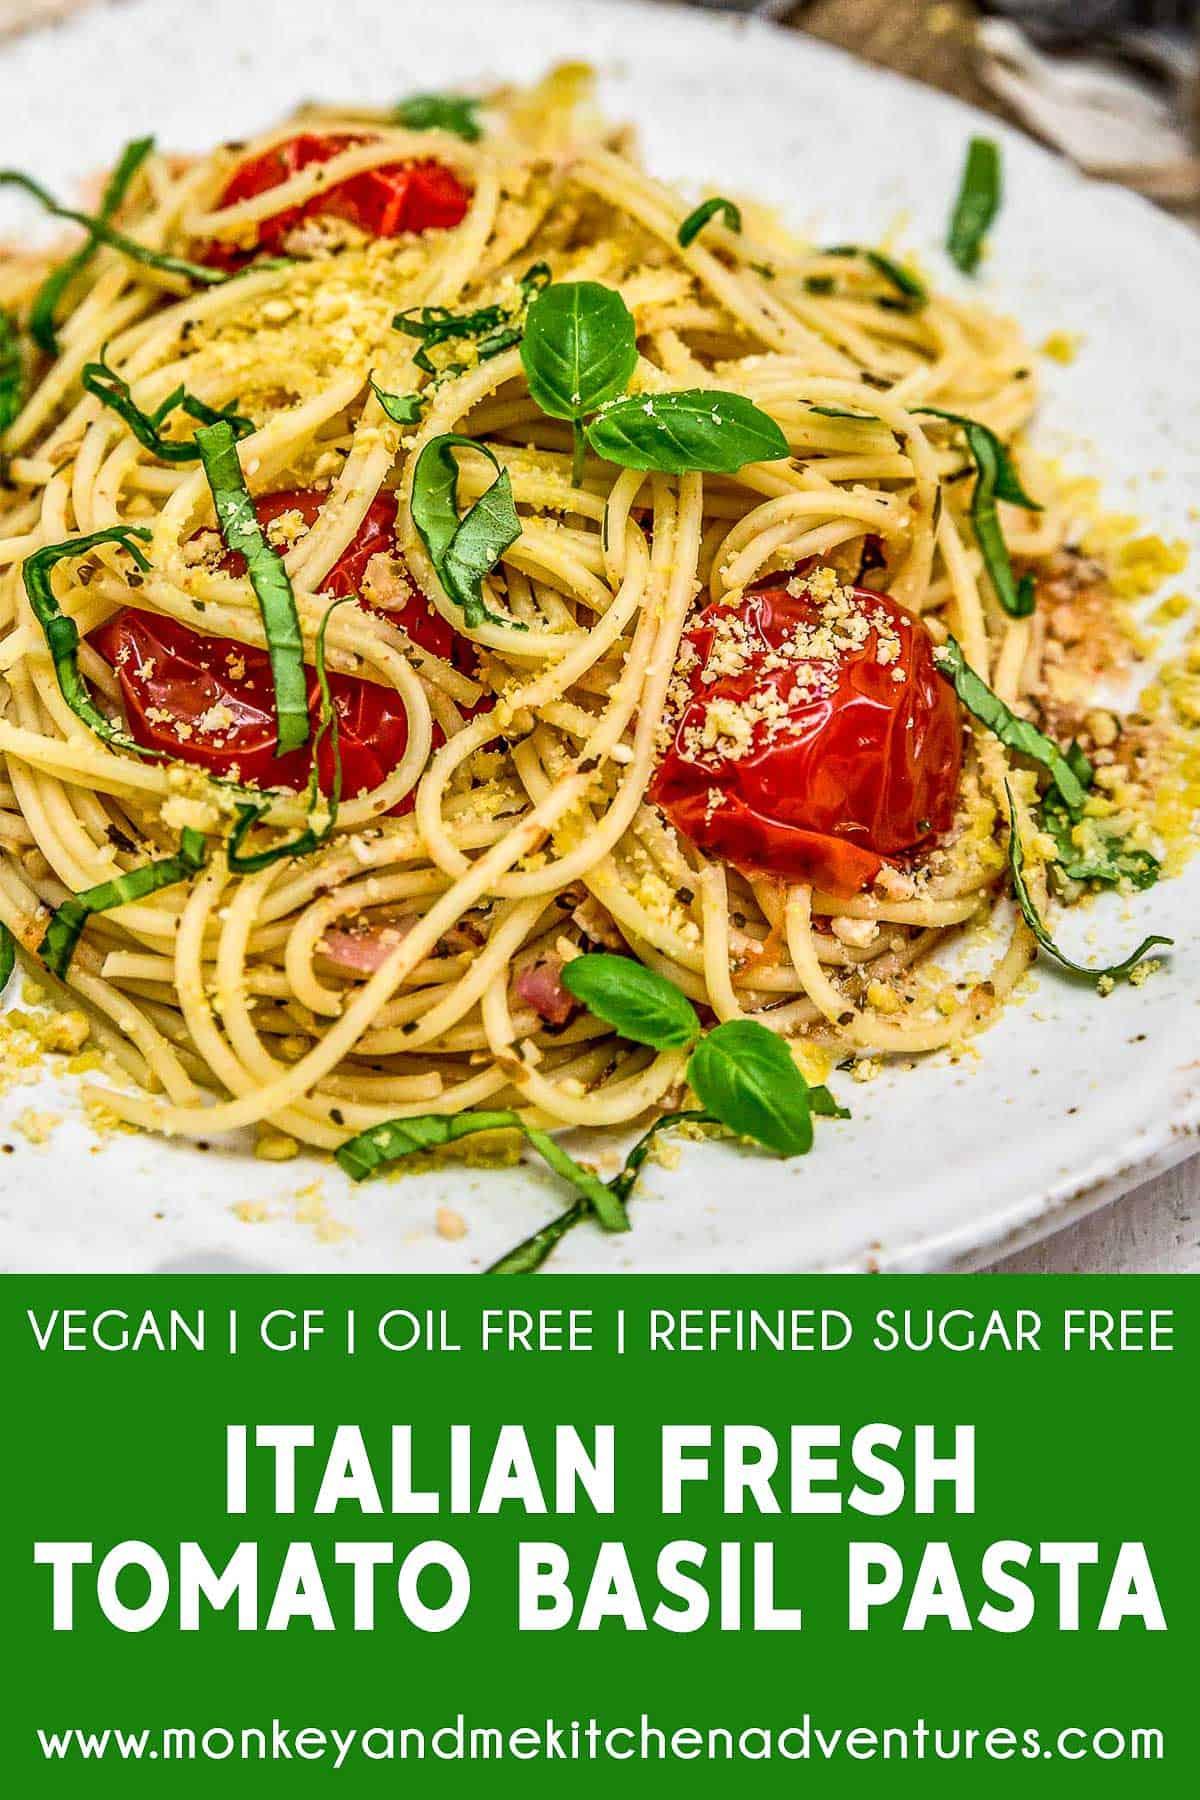 Italian Fresh Tomato Basil Pasta with text description